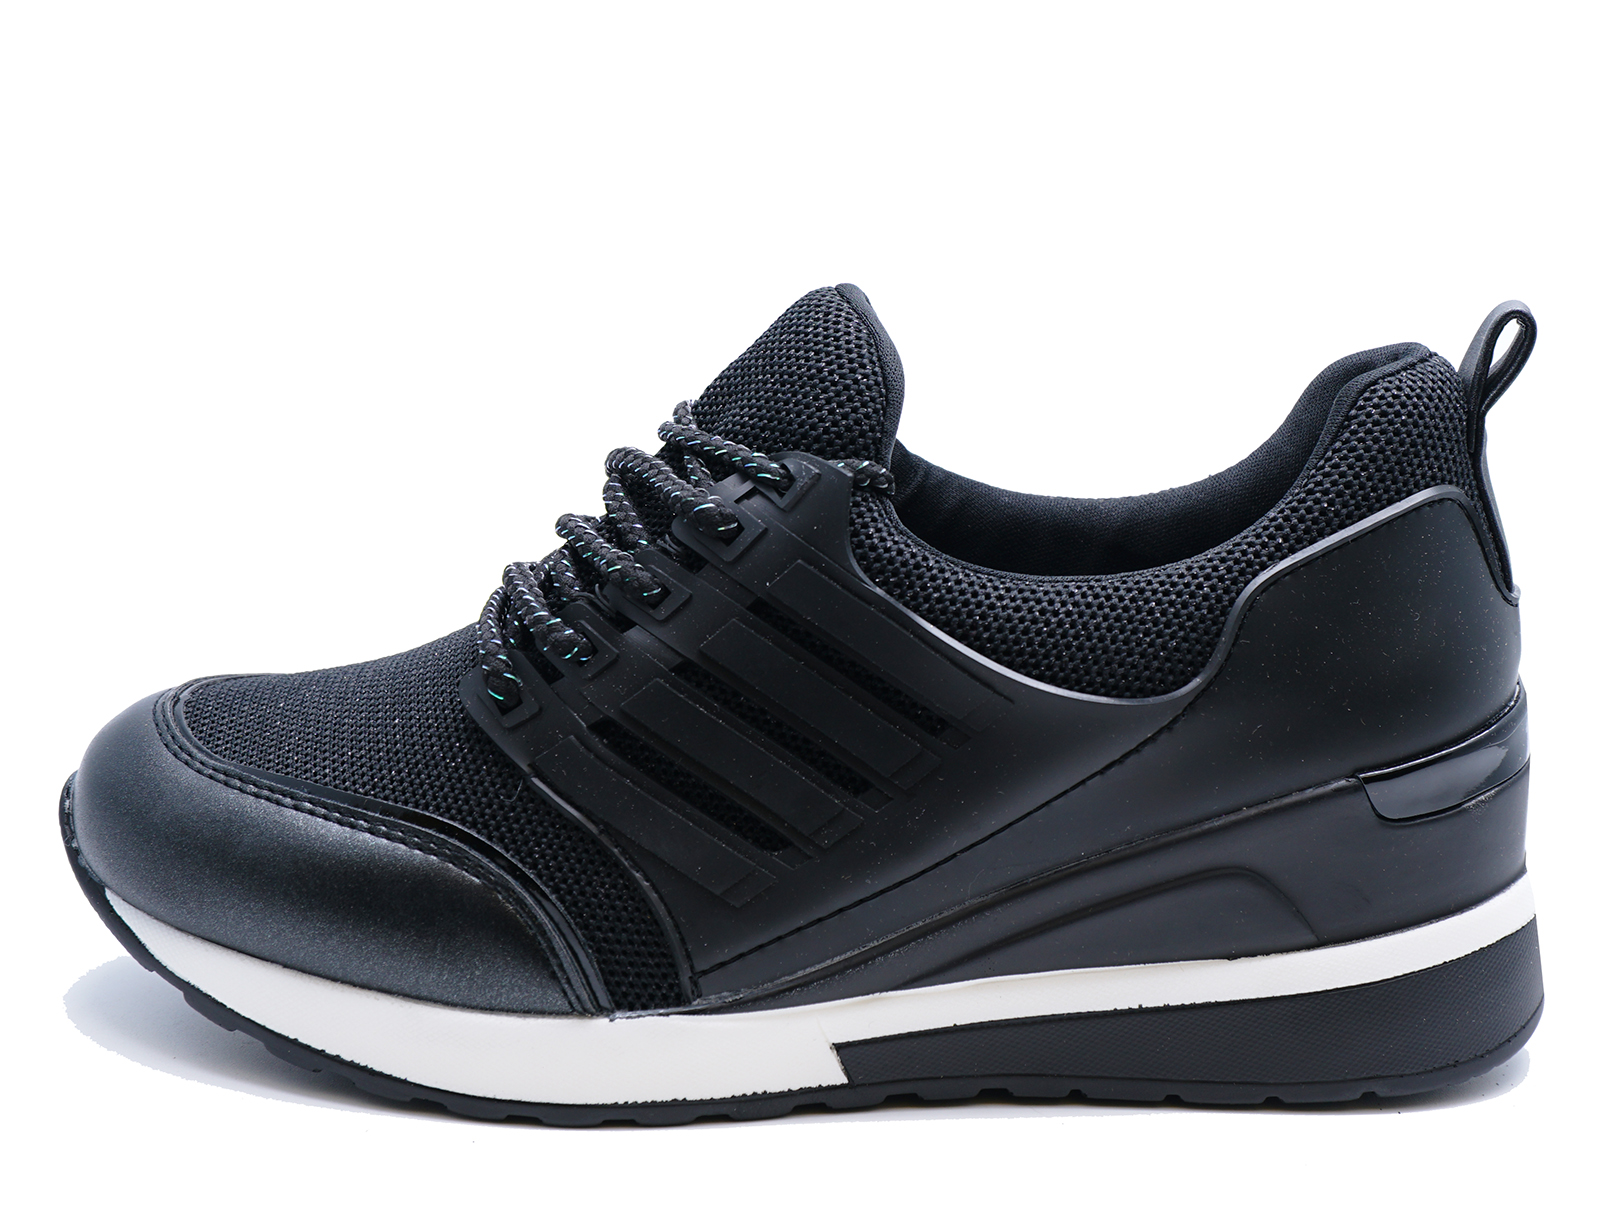 WOMENS BLACK SLIP-ON RUNNING WEDGE TRAINERS GYM PUMPS PLIMSOLLS SHOES UK 3-8